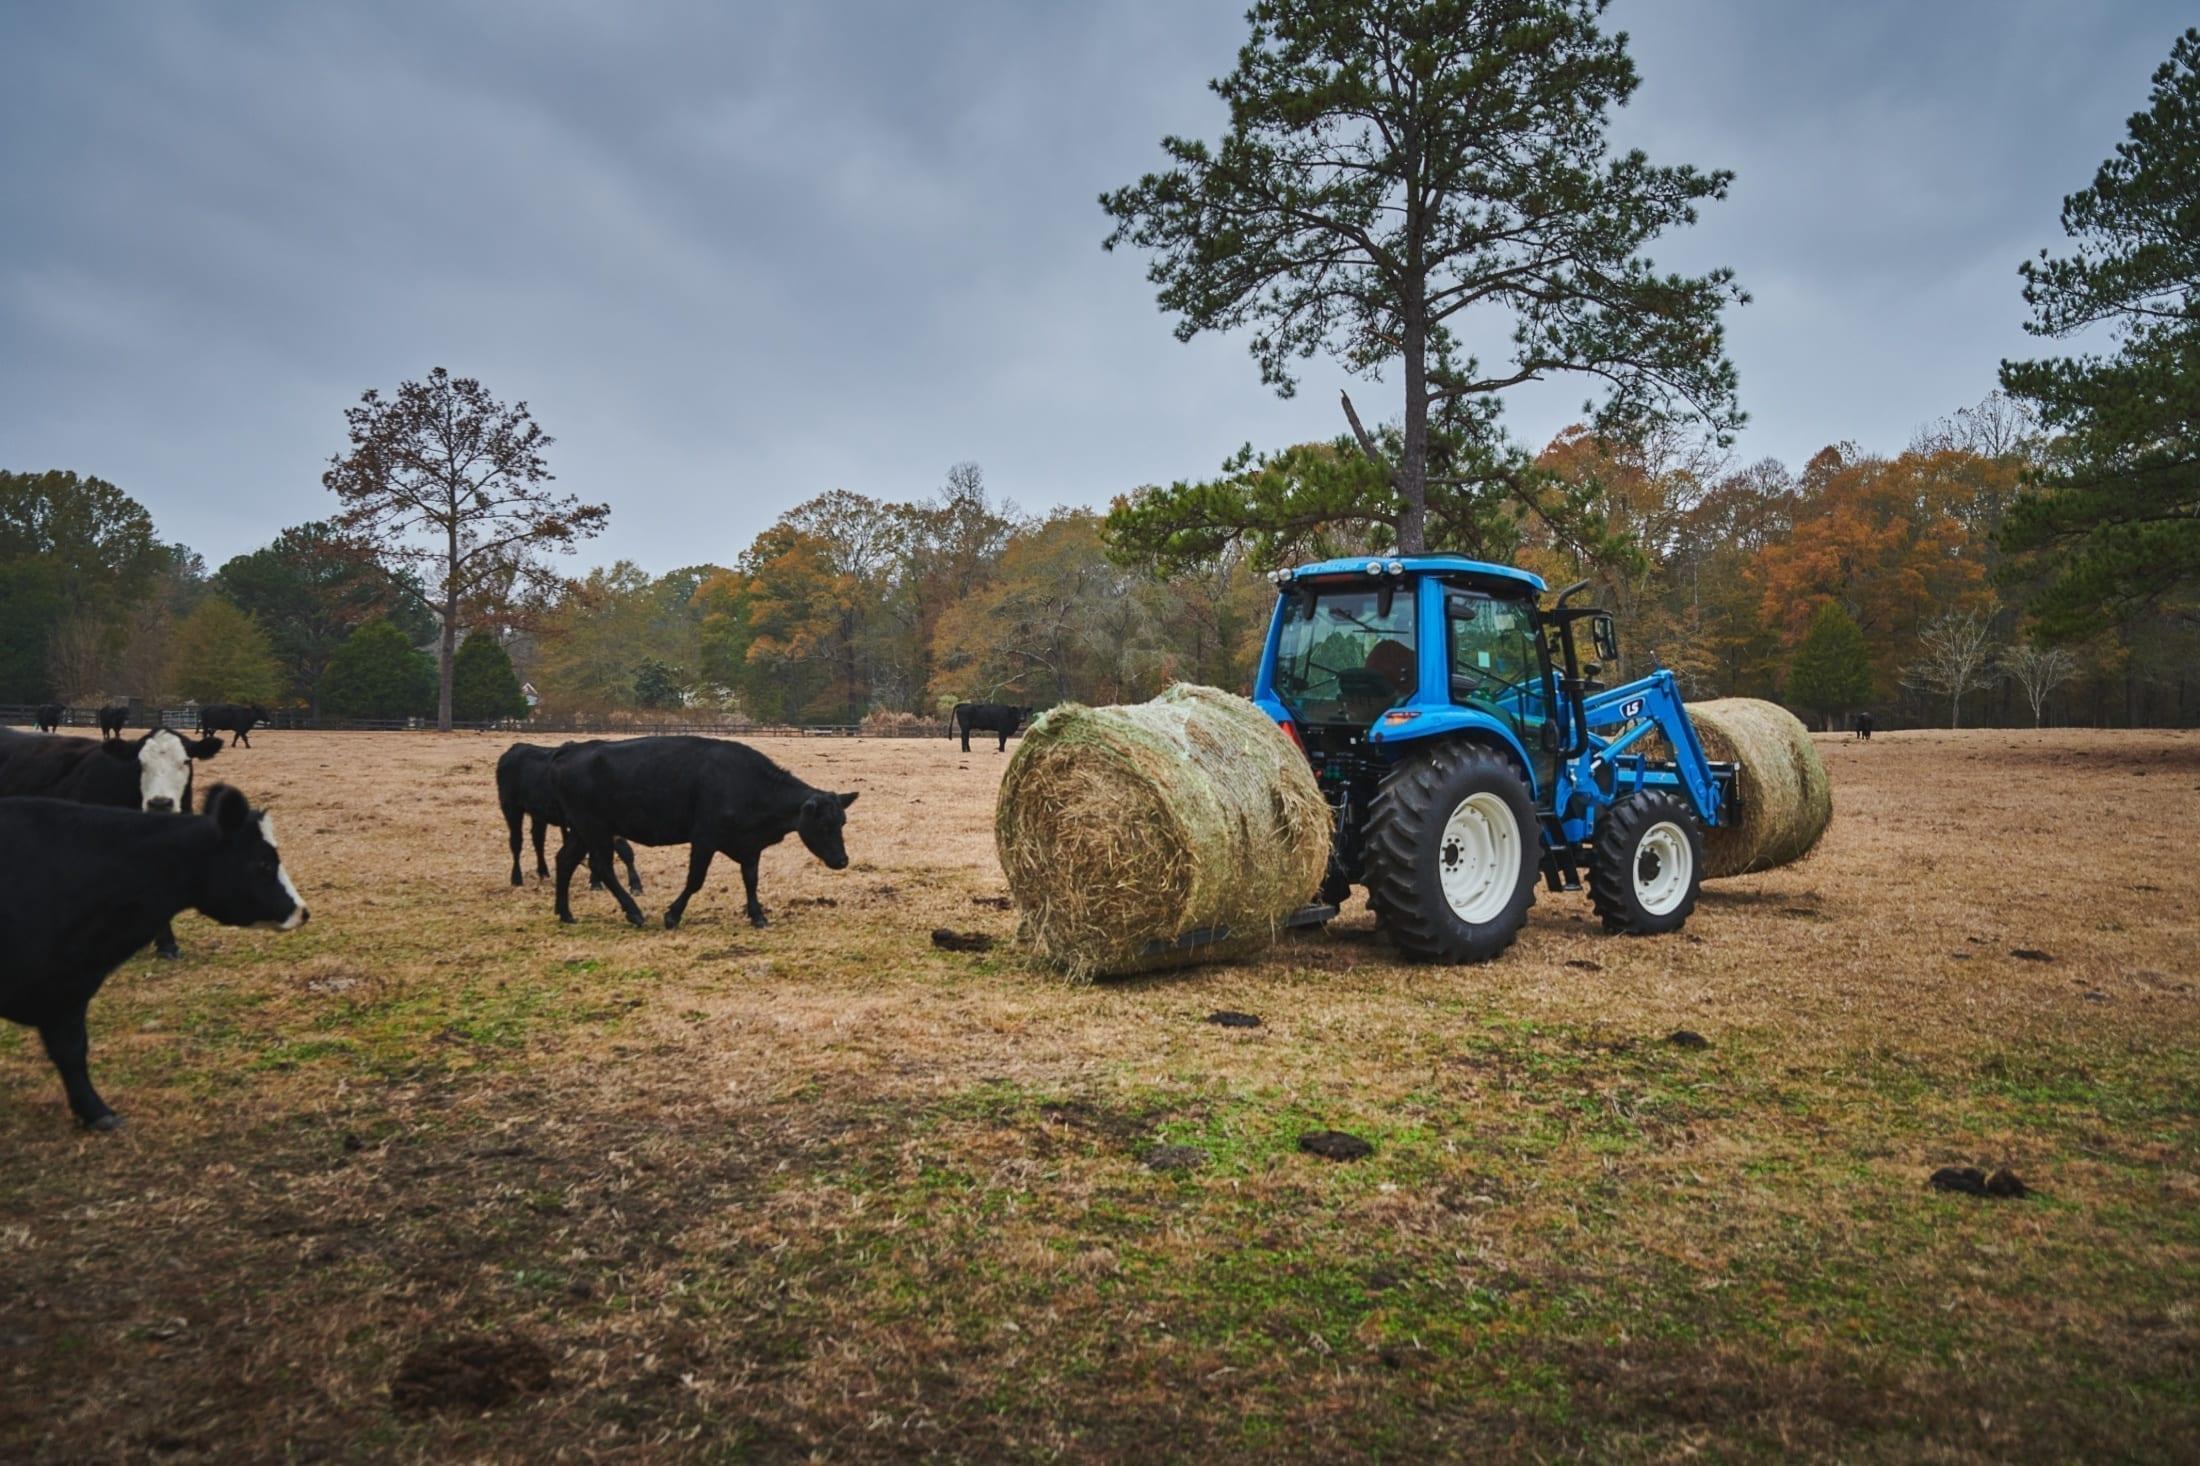 Tractor Lifestyle Photo